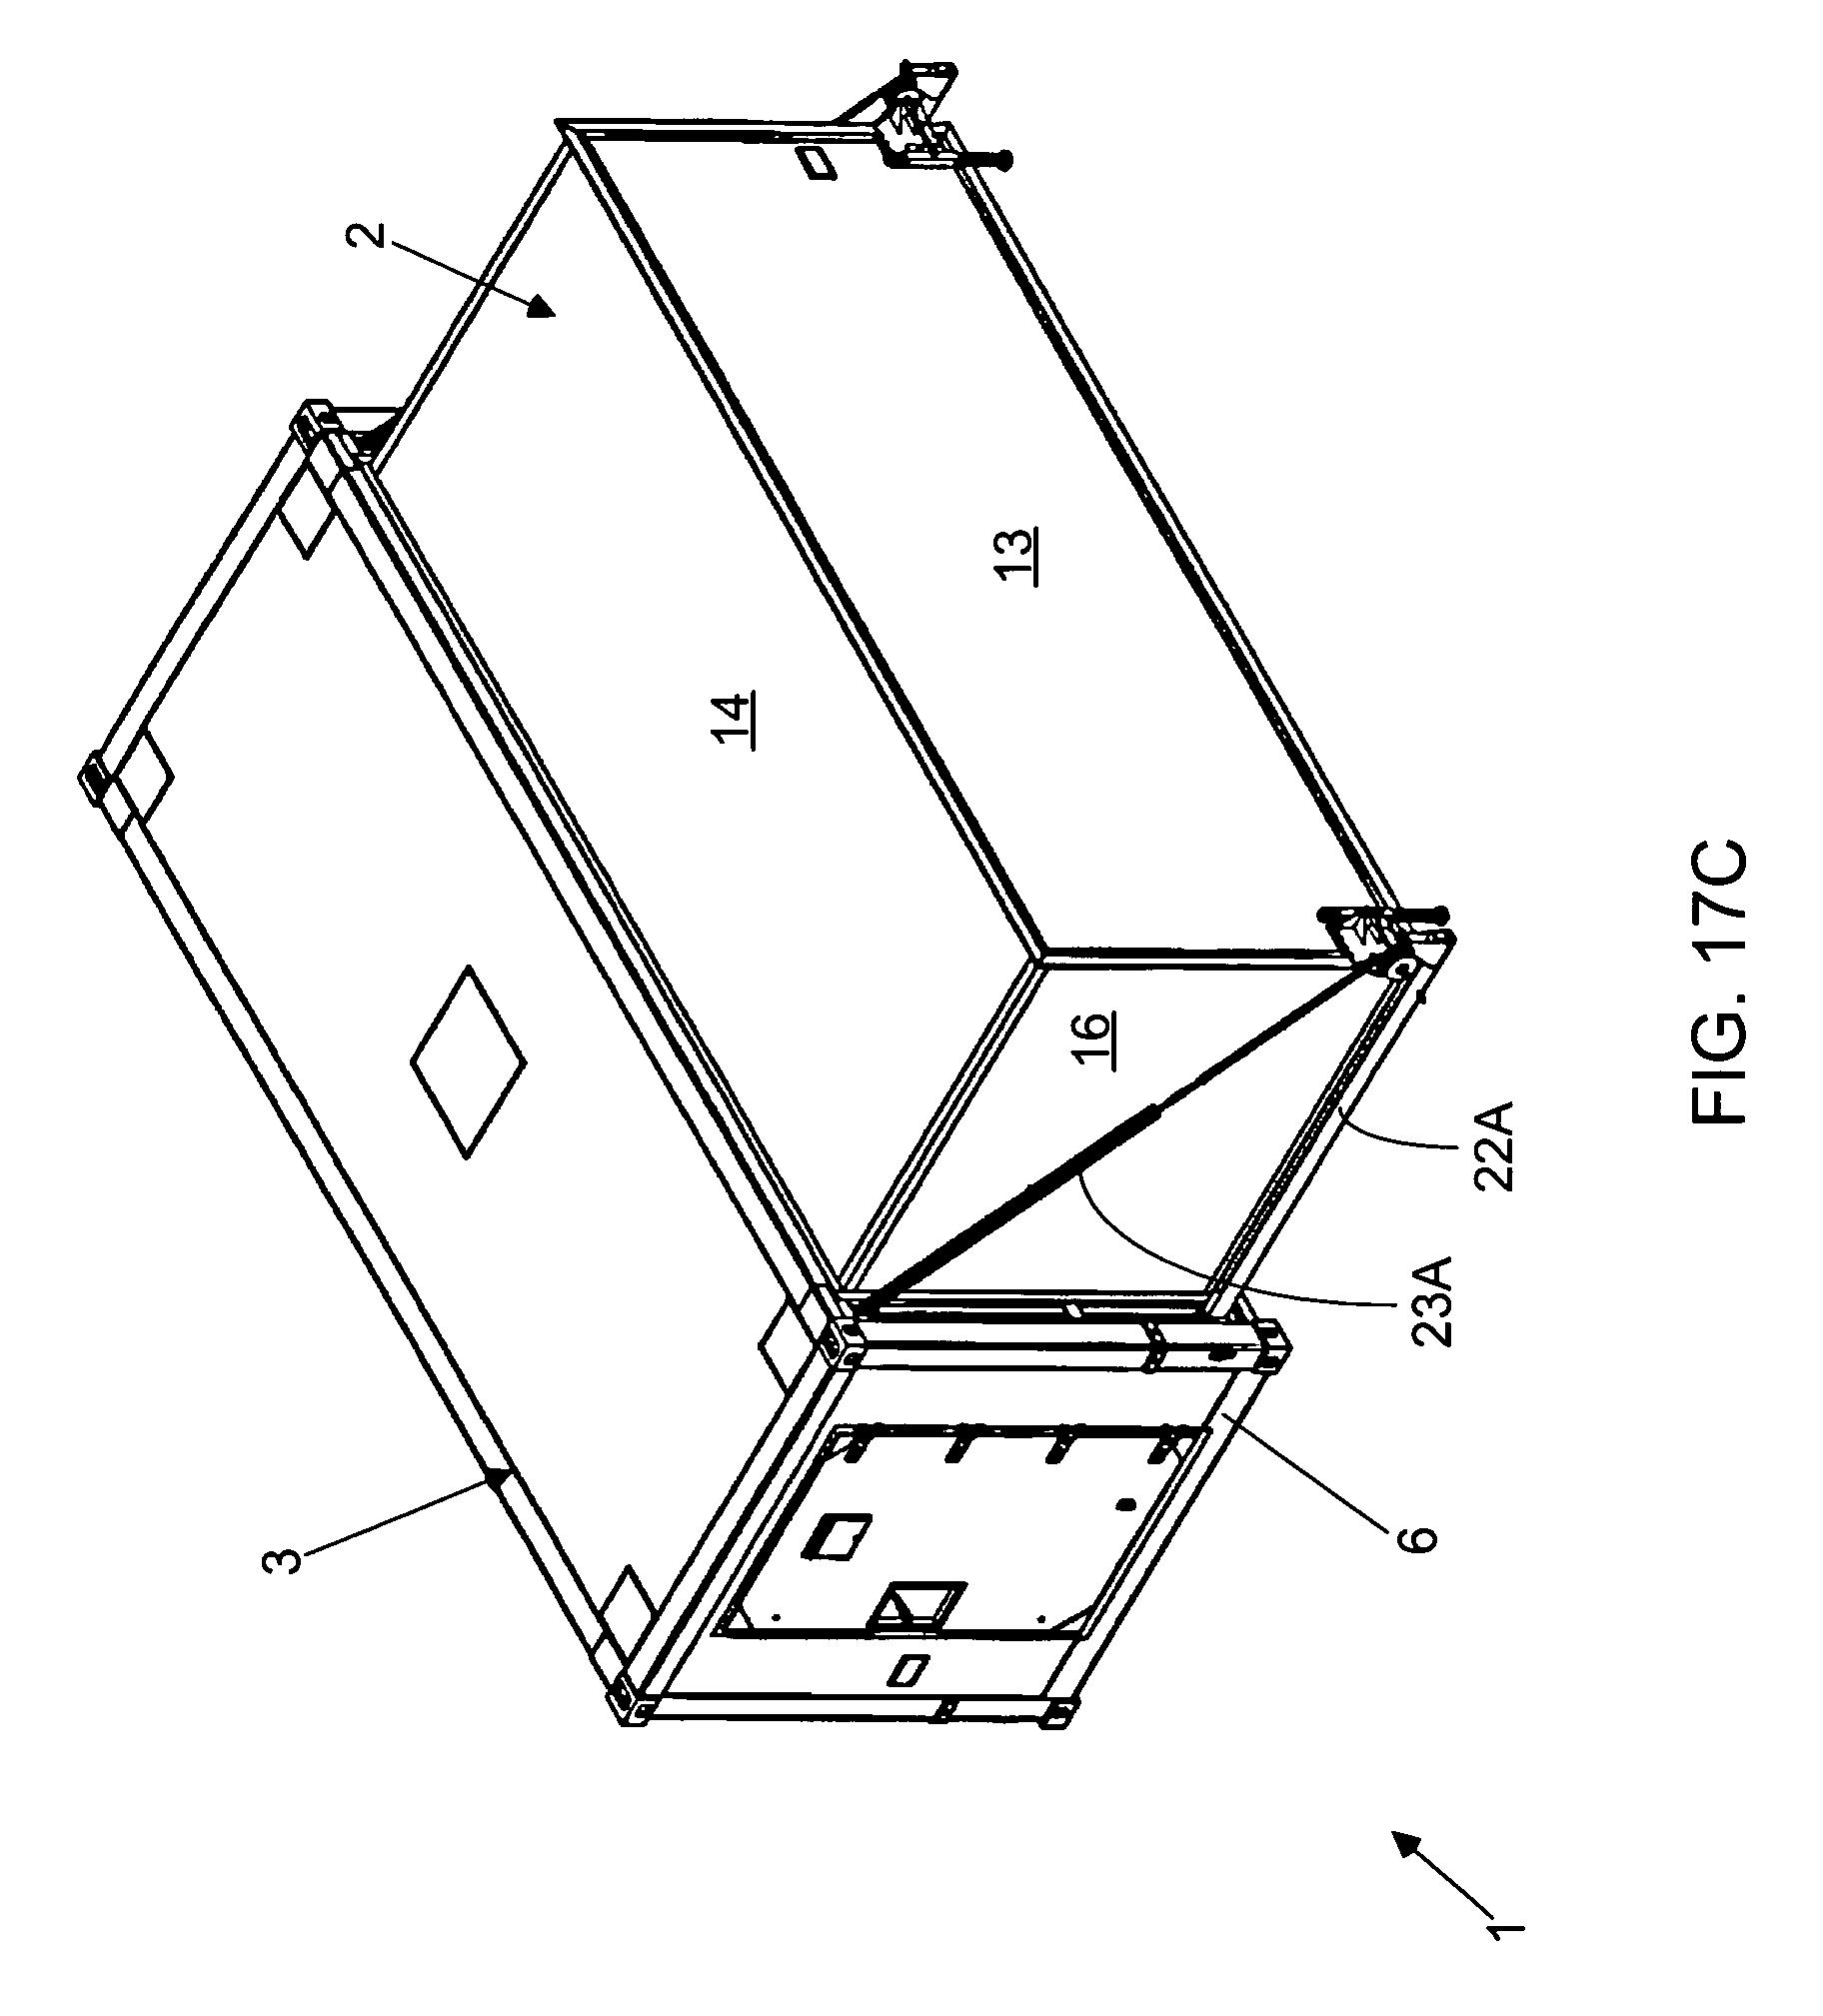 Expandable Shelter System : Patent us expandable shelter system google patents